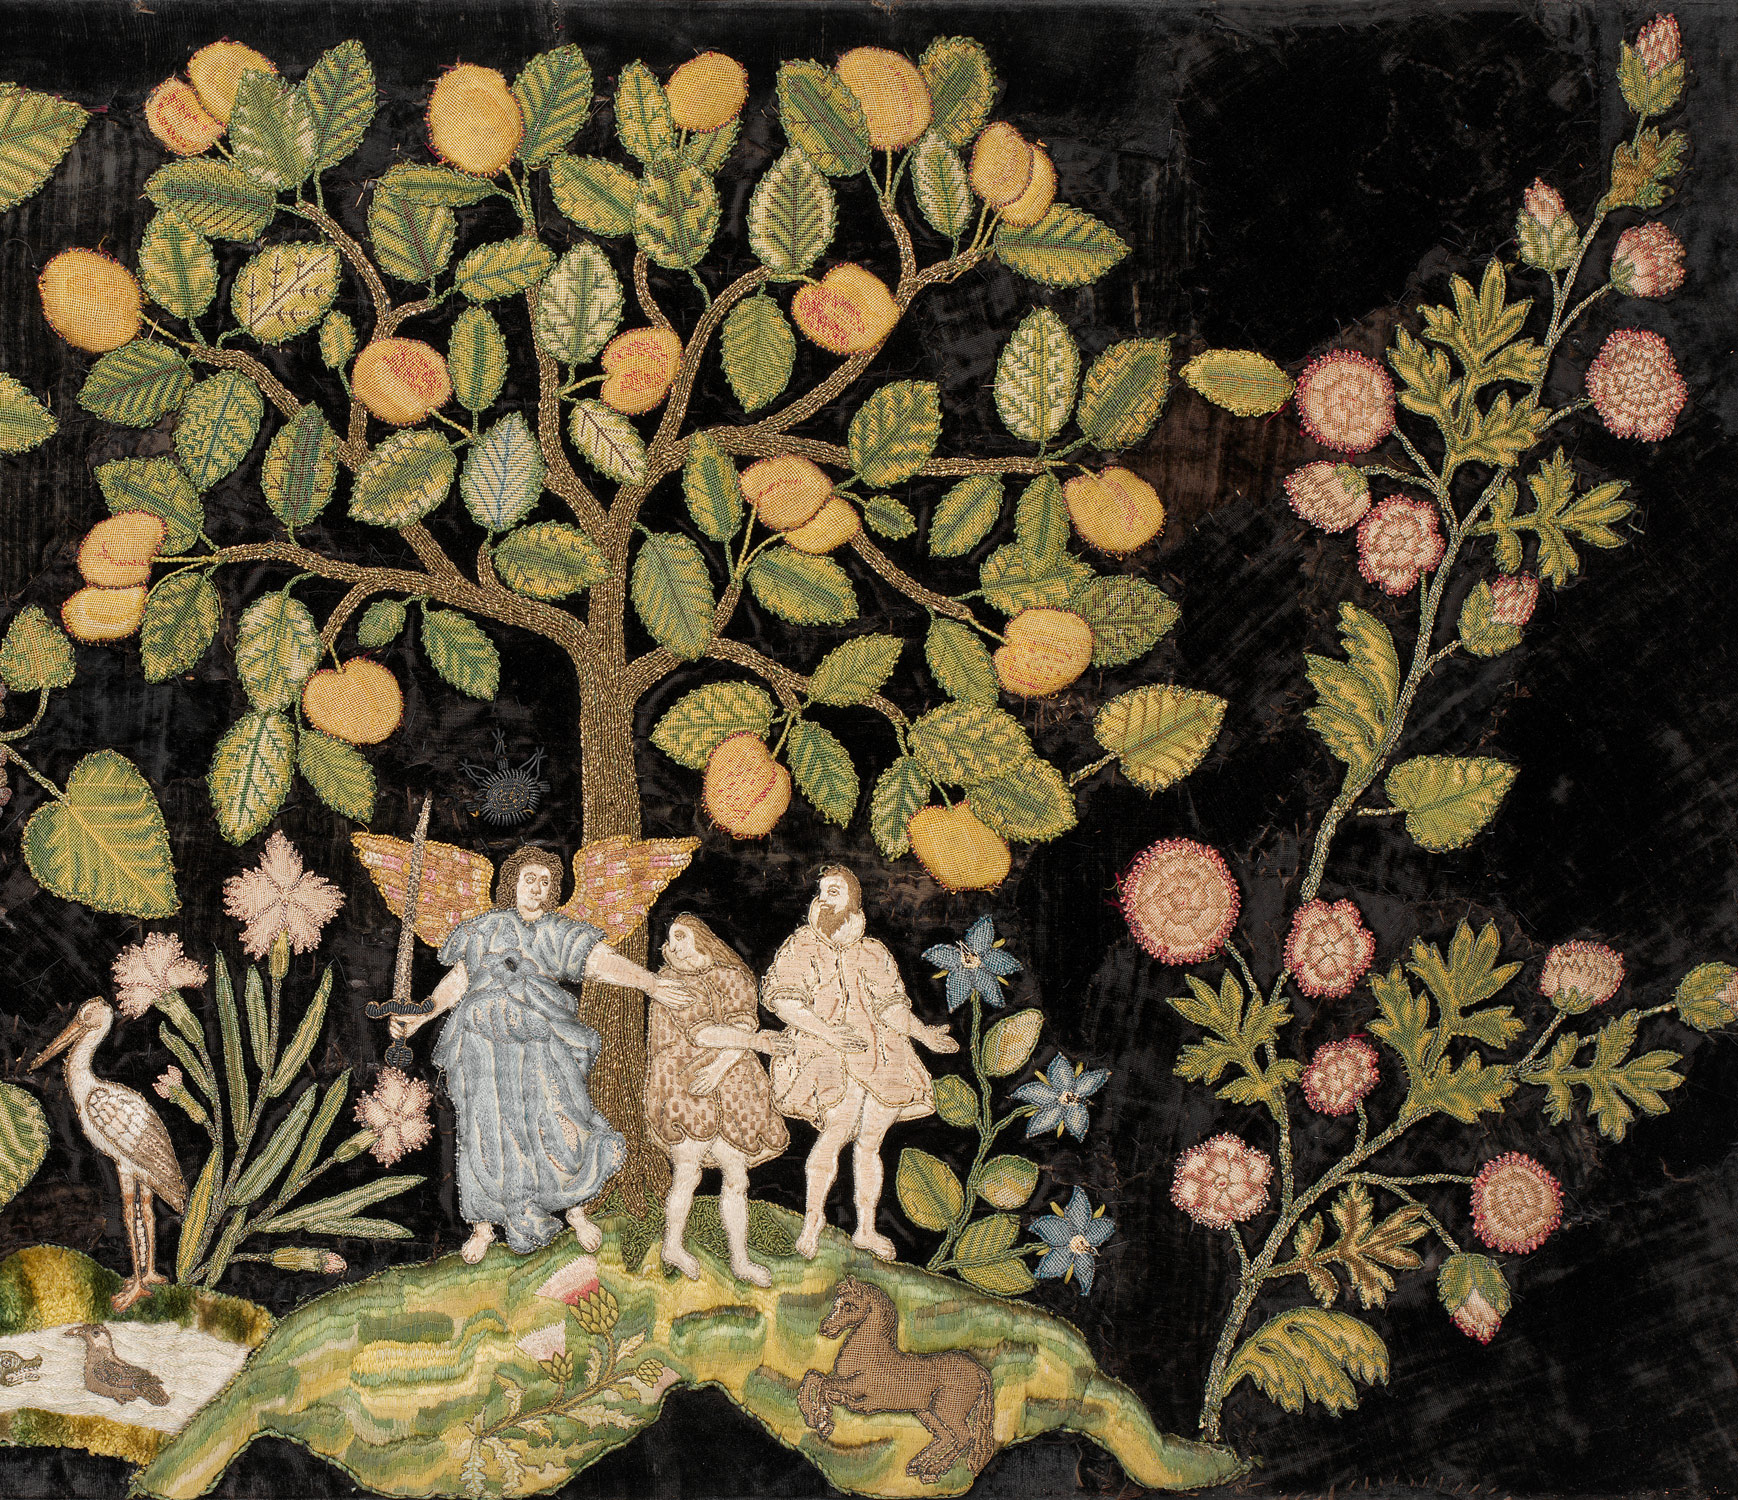 Garden Of Eden clipart gardenof Garden Heilbrunn Art of History